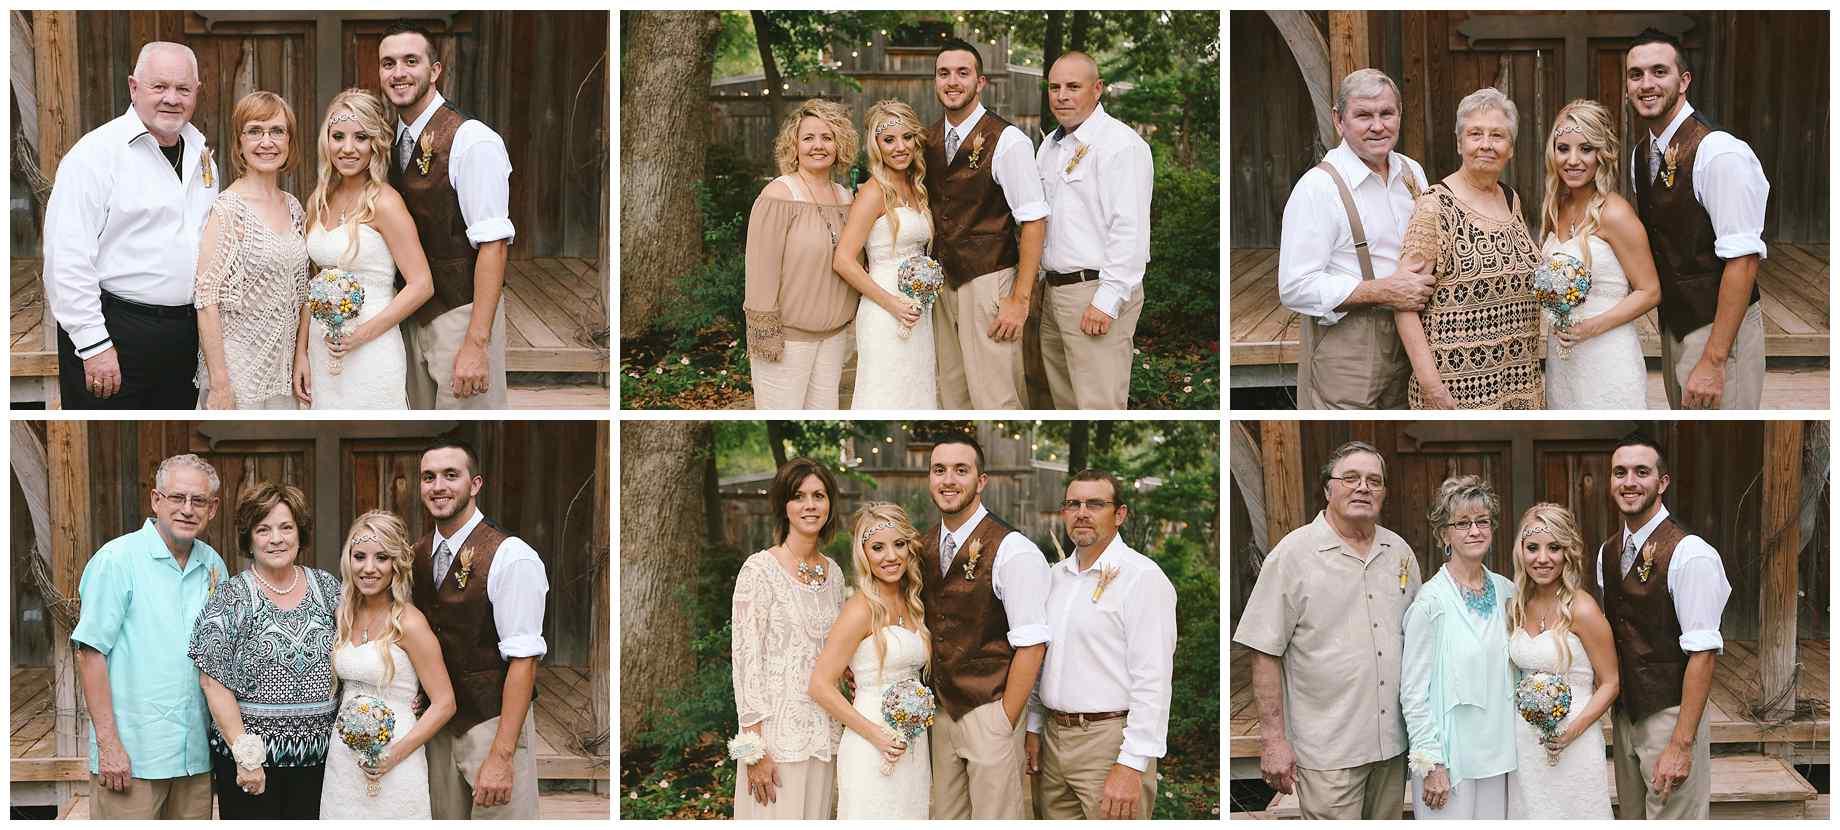 stone-oak-ranch-outdoor-wedding-026